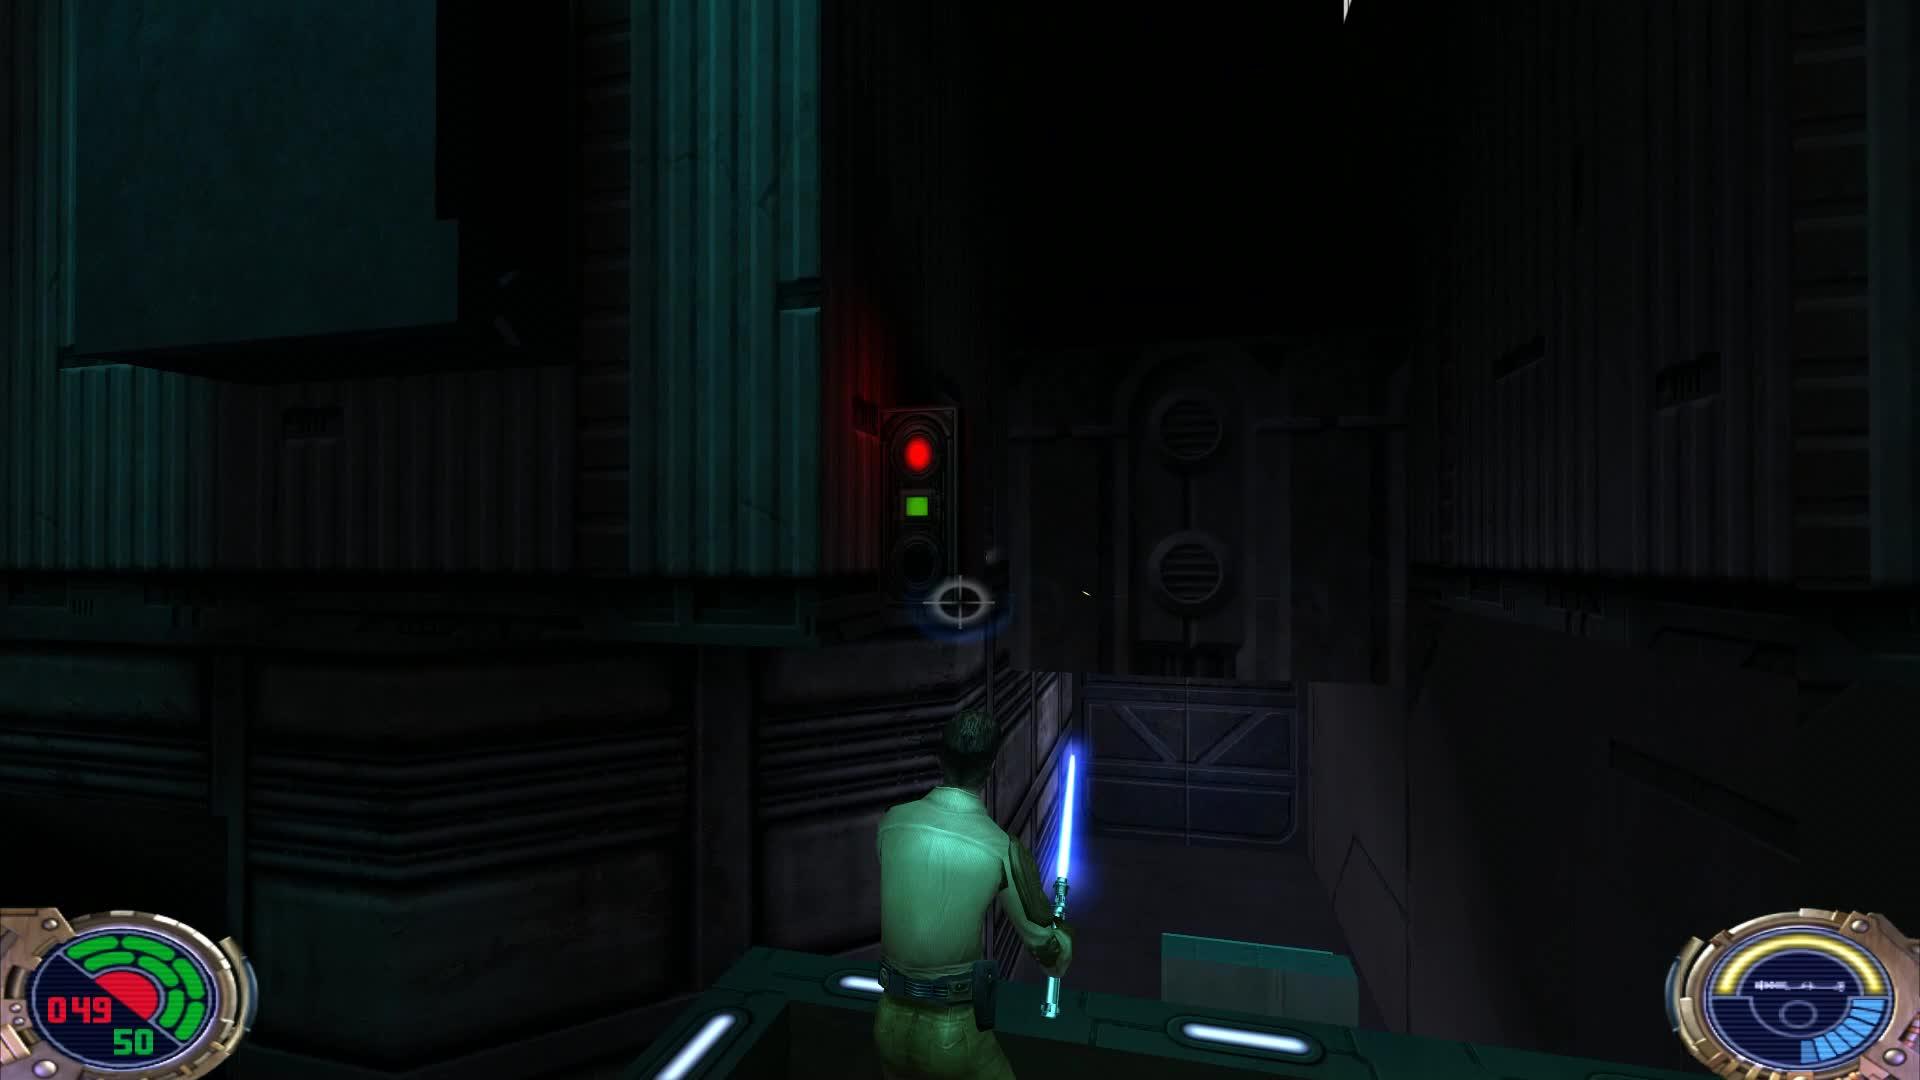 lost saber GIFs